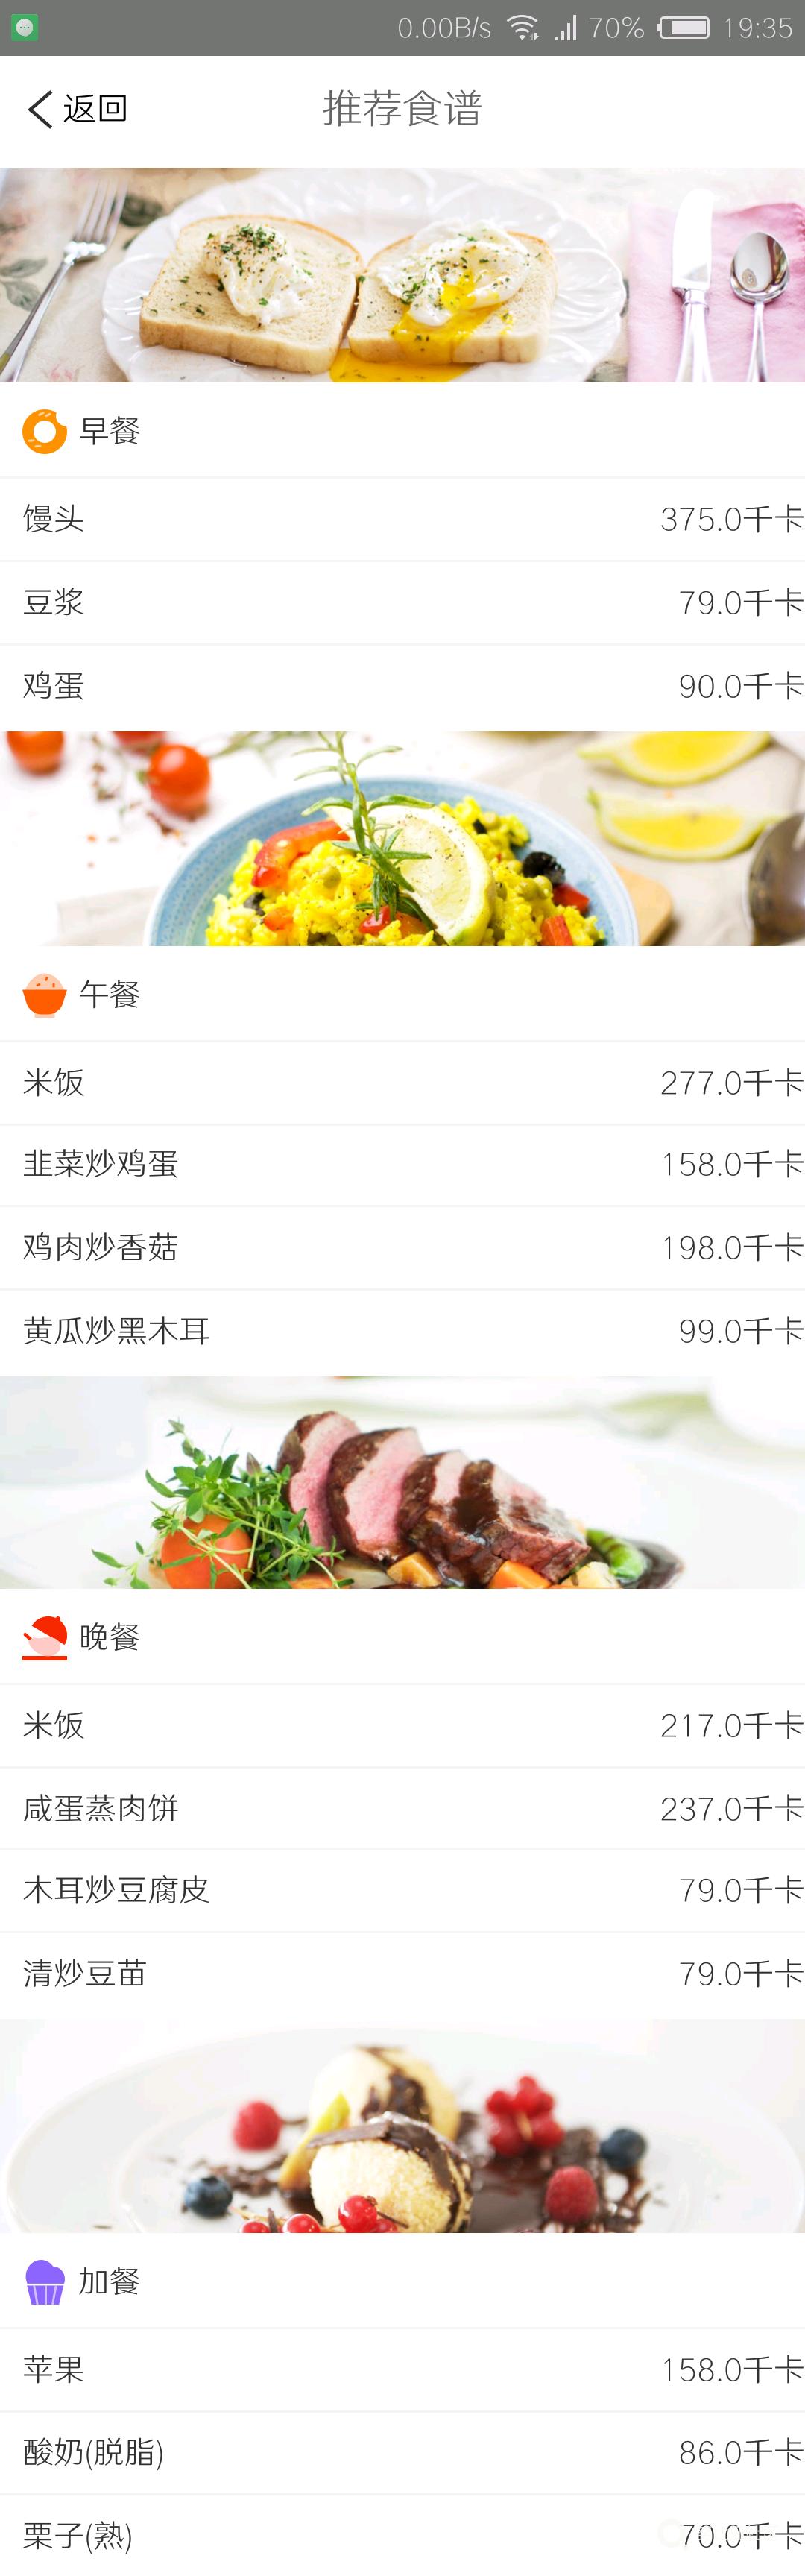 Screenshot_2018-01-25-19-36-00.png